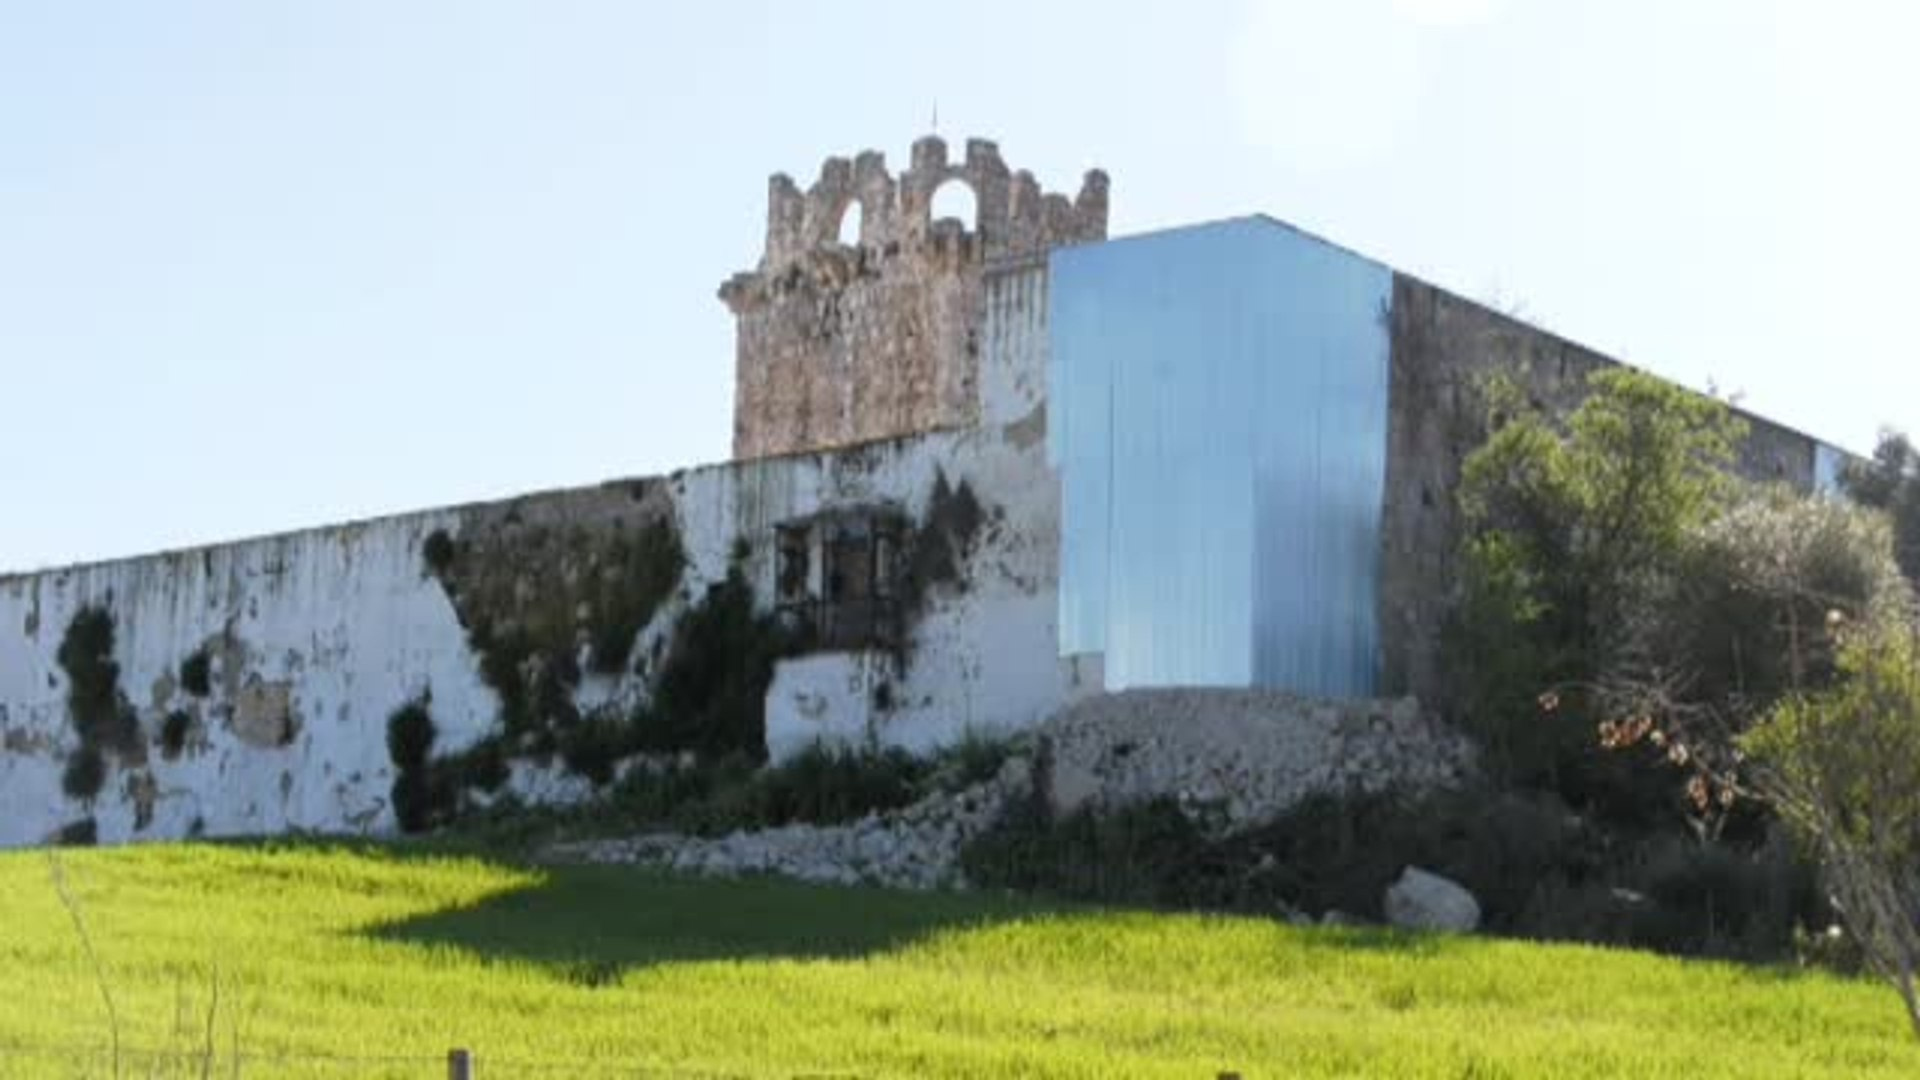 La fortaleza medieval de Jerez necesita ser restaurada